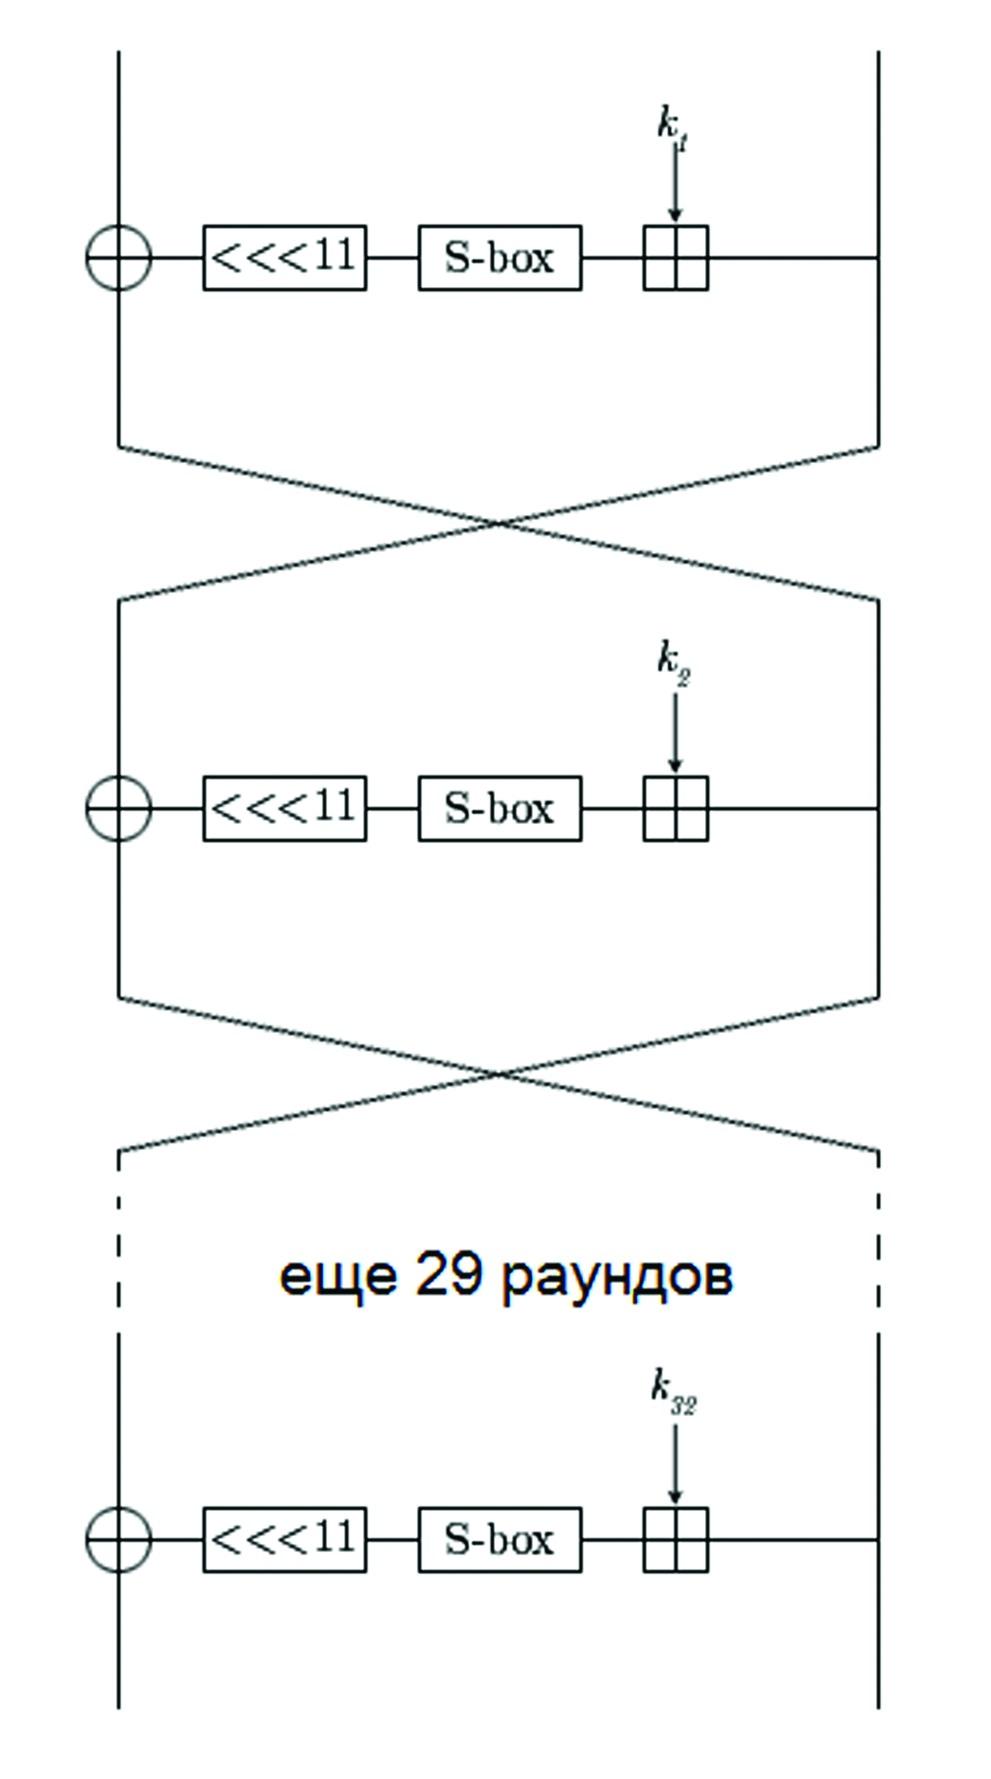 Схема алгоритма, описанного в ГОСТе 28147-89